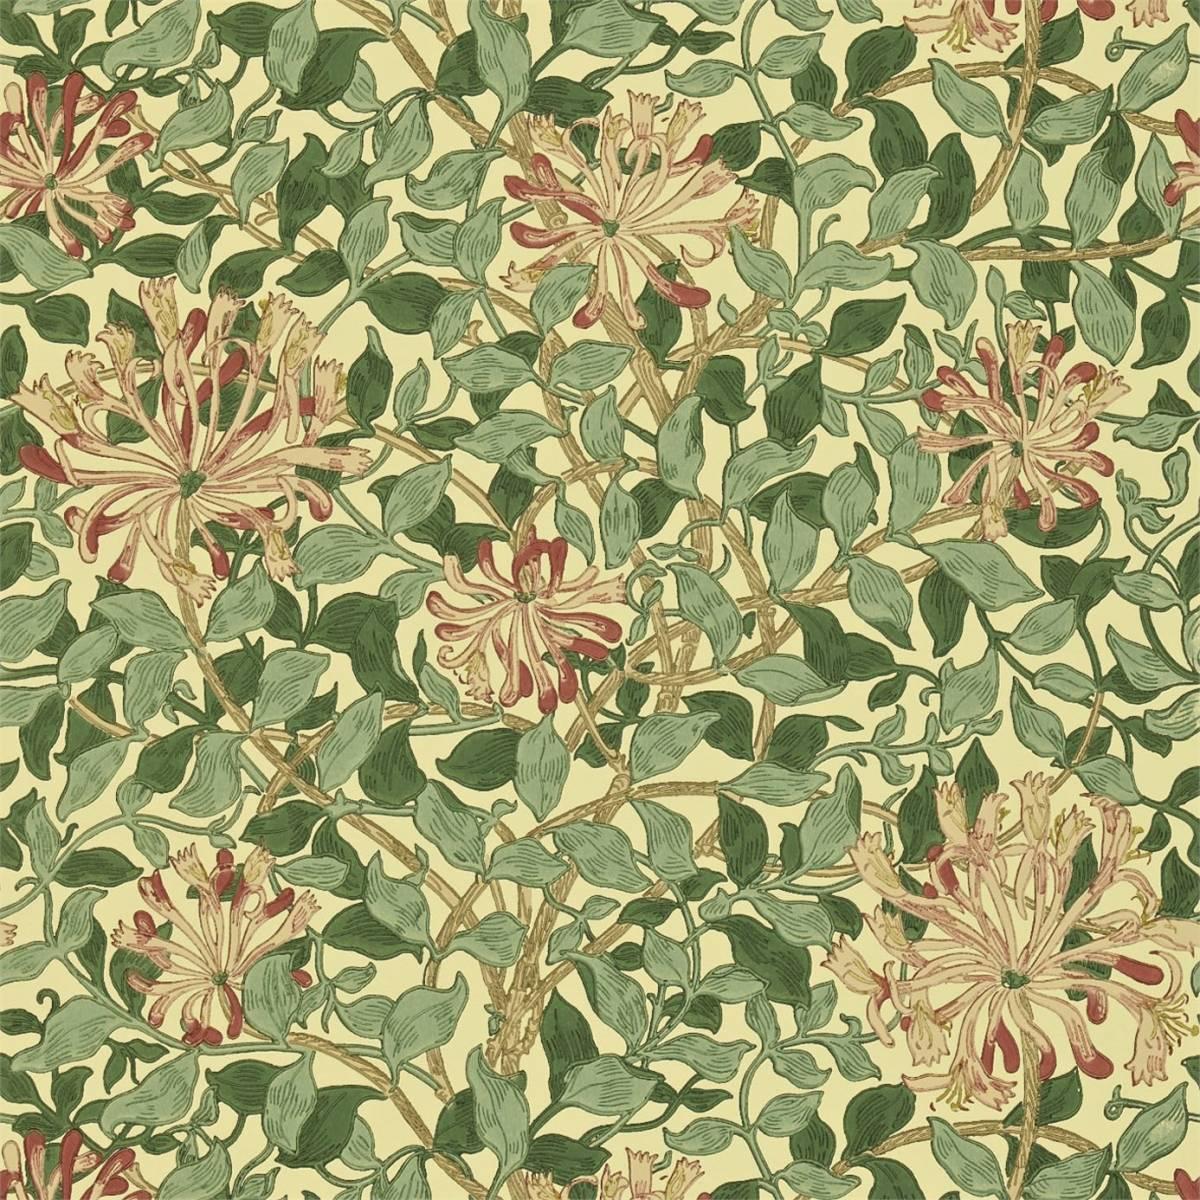 Honeysuckle Wallpaper - Green/Coral Pink (210436 ...